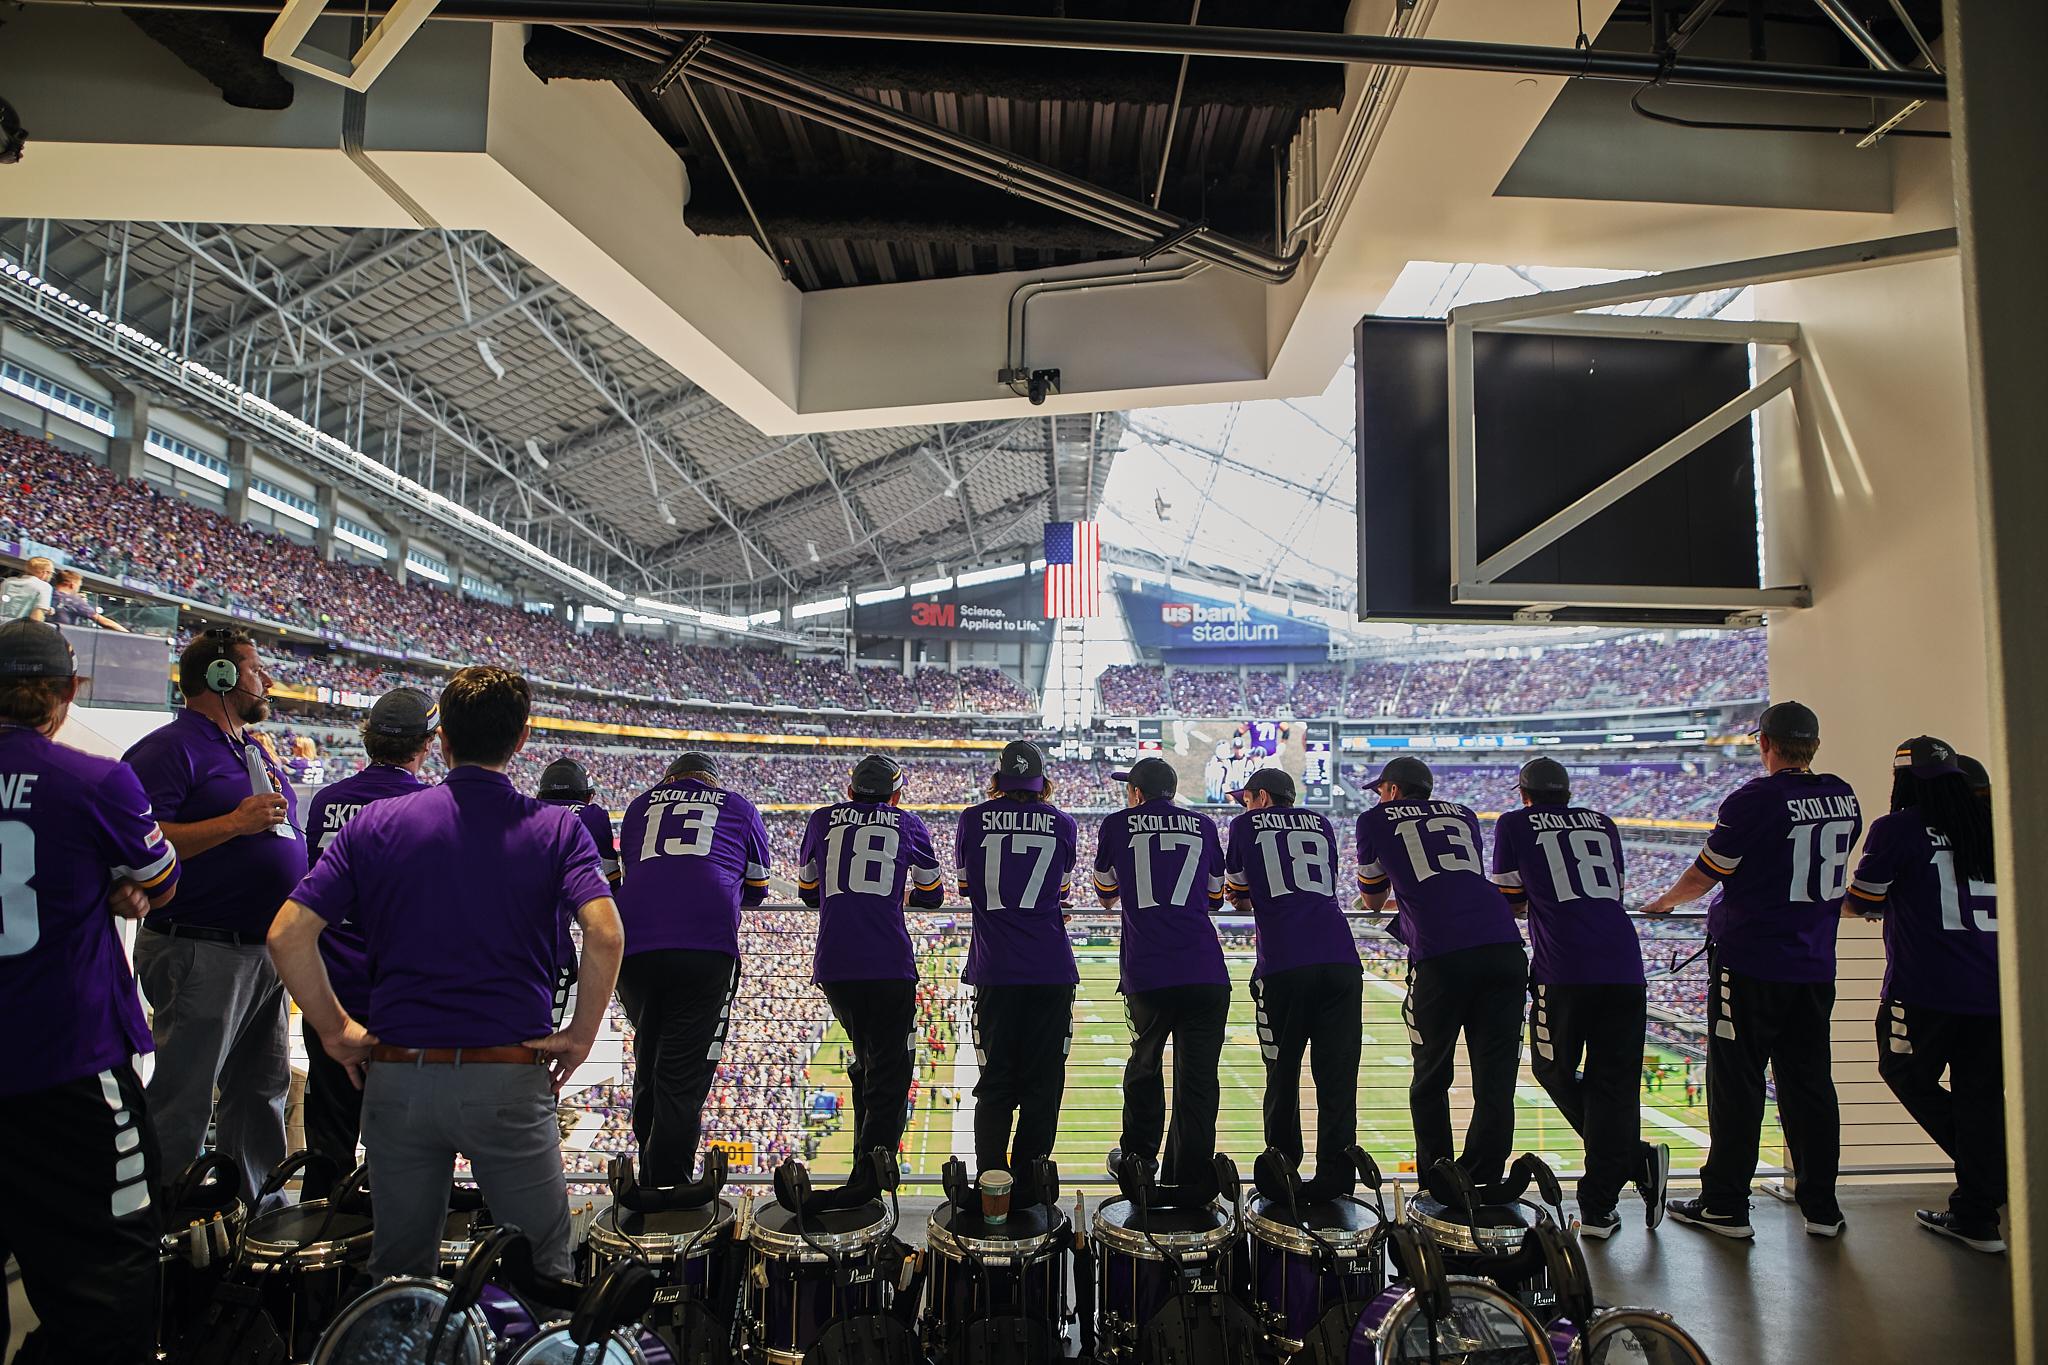 Minnesota_Vikings_Game_US_Bank_Stadium_Minneapolis_Minnesota_Photography_By_Joe_Lemke_056.JPG